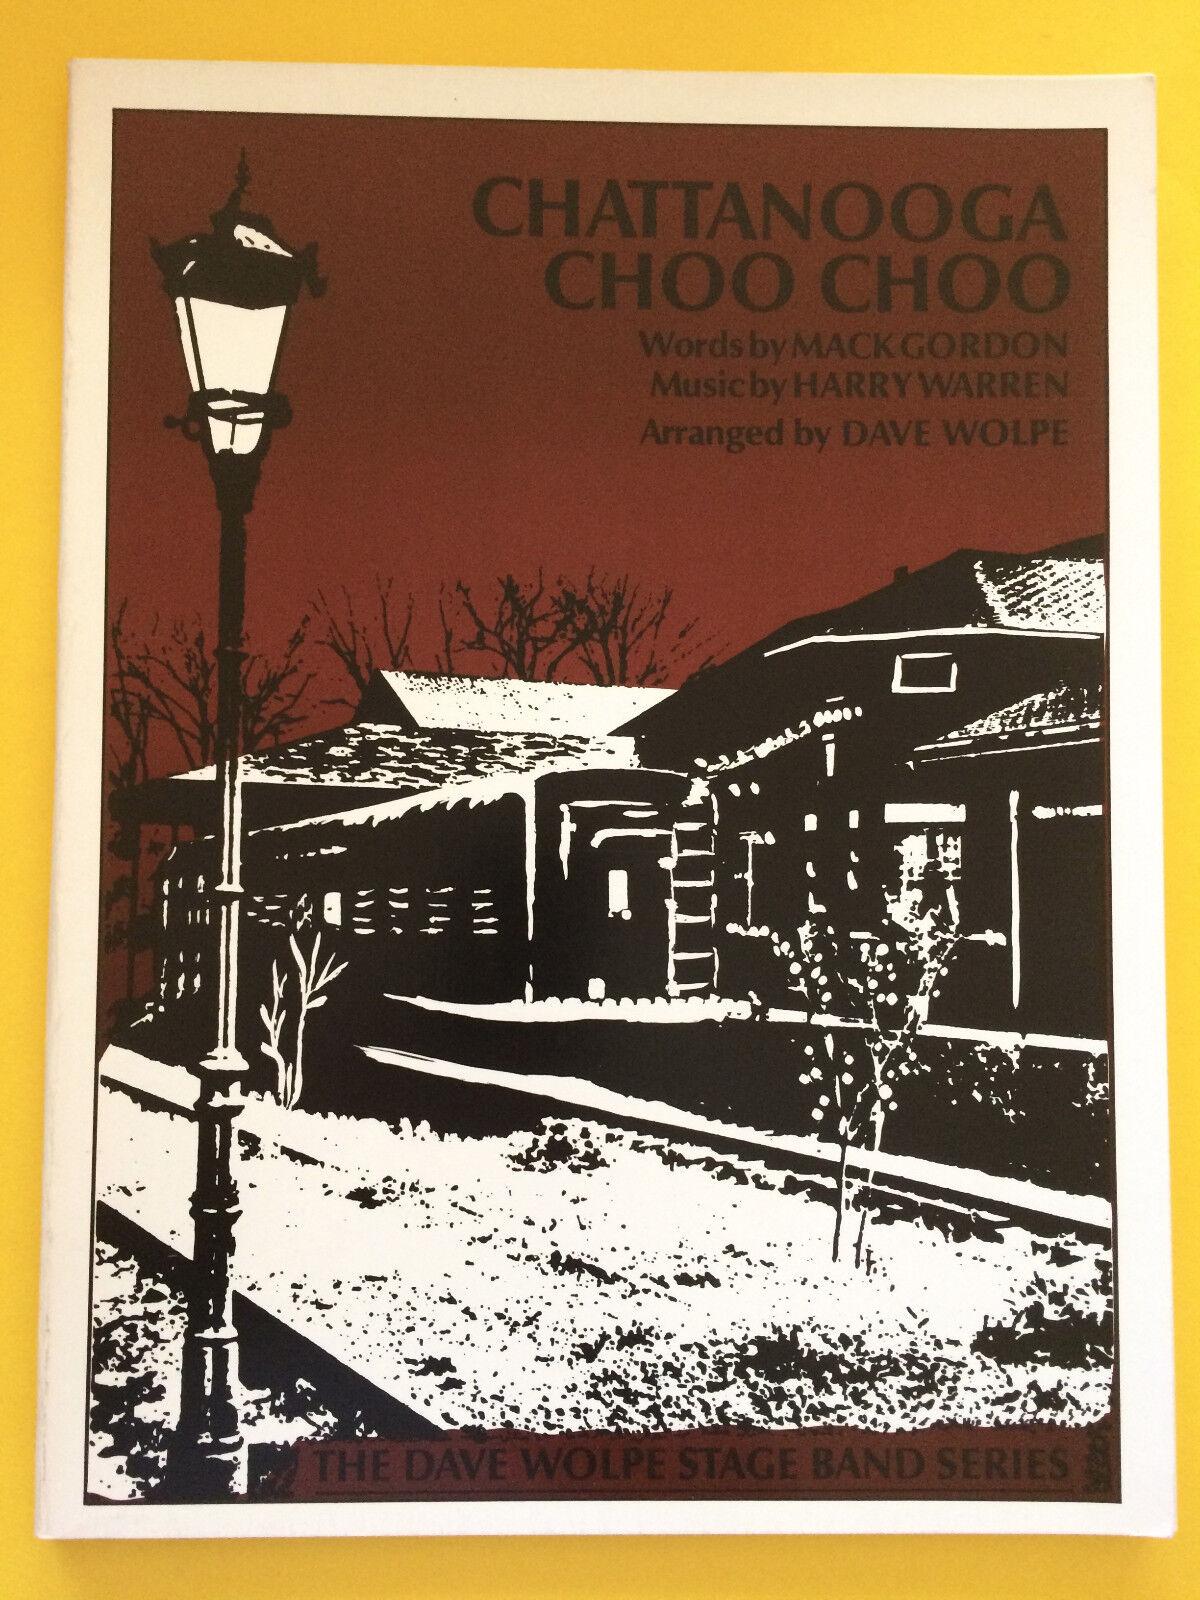 Chattanooga Choo Choo, Harry Warren, arr. Dave Wolpe, Big Band Arrangement